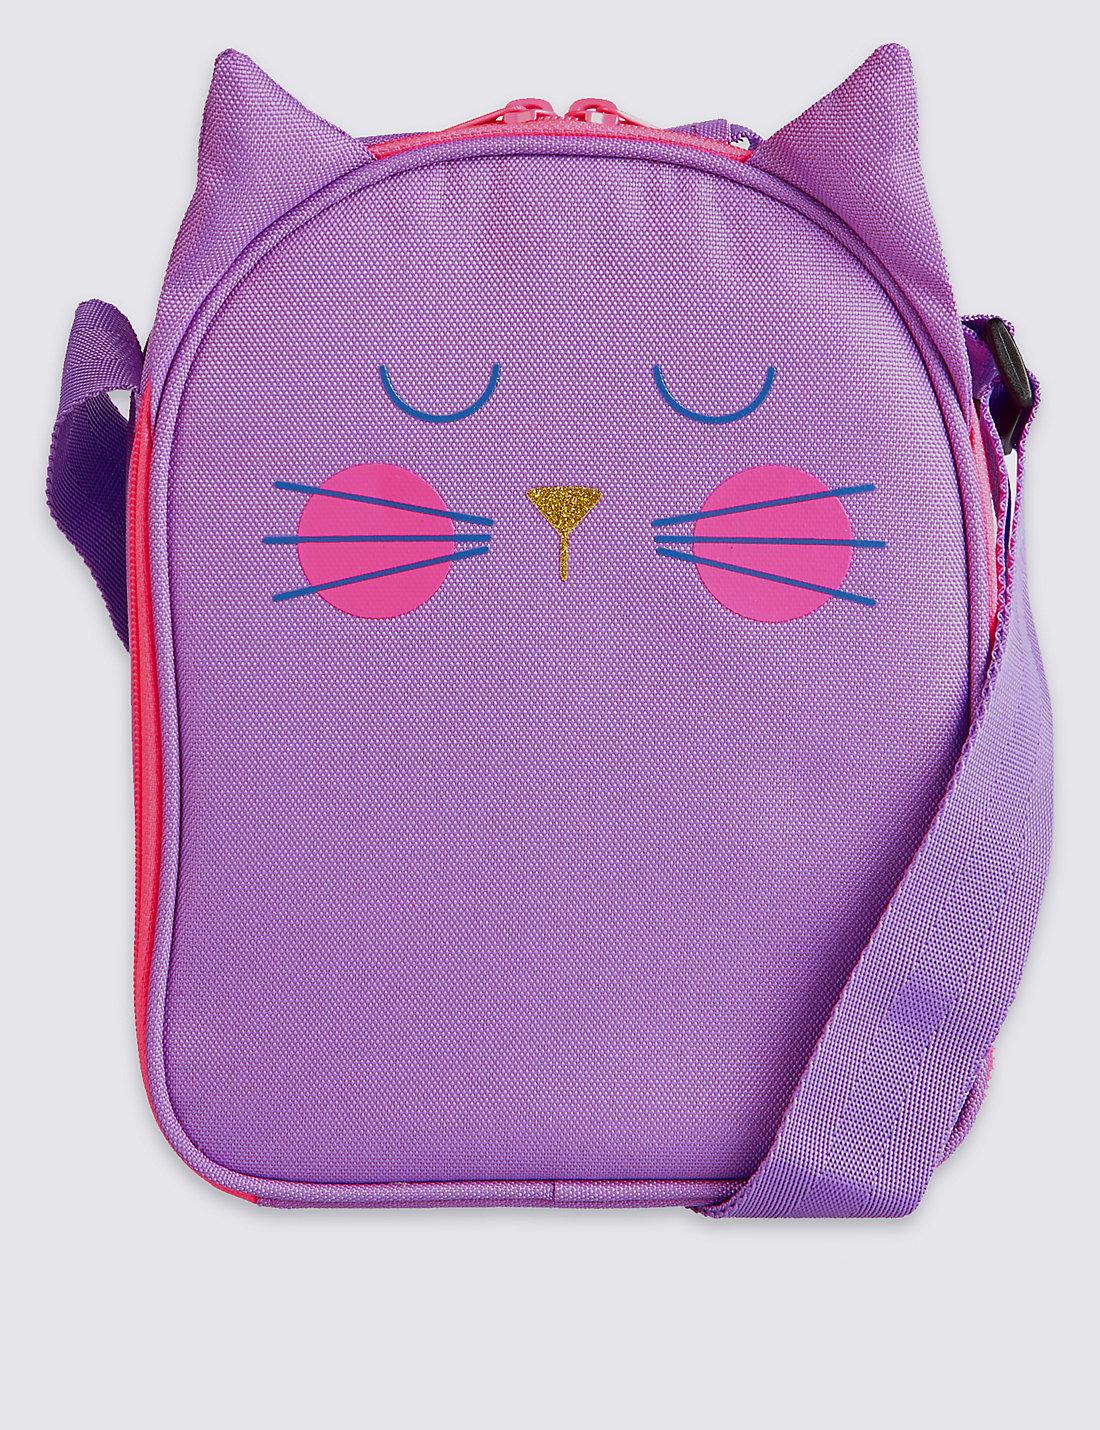 Kidsu0027 Cat Lunch Box with Thinsulate™ & Kidsu0027 Cat Lunch Box with Thinsulate™ | Mu0026S Aboutintivar.Com